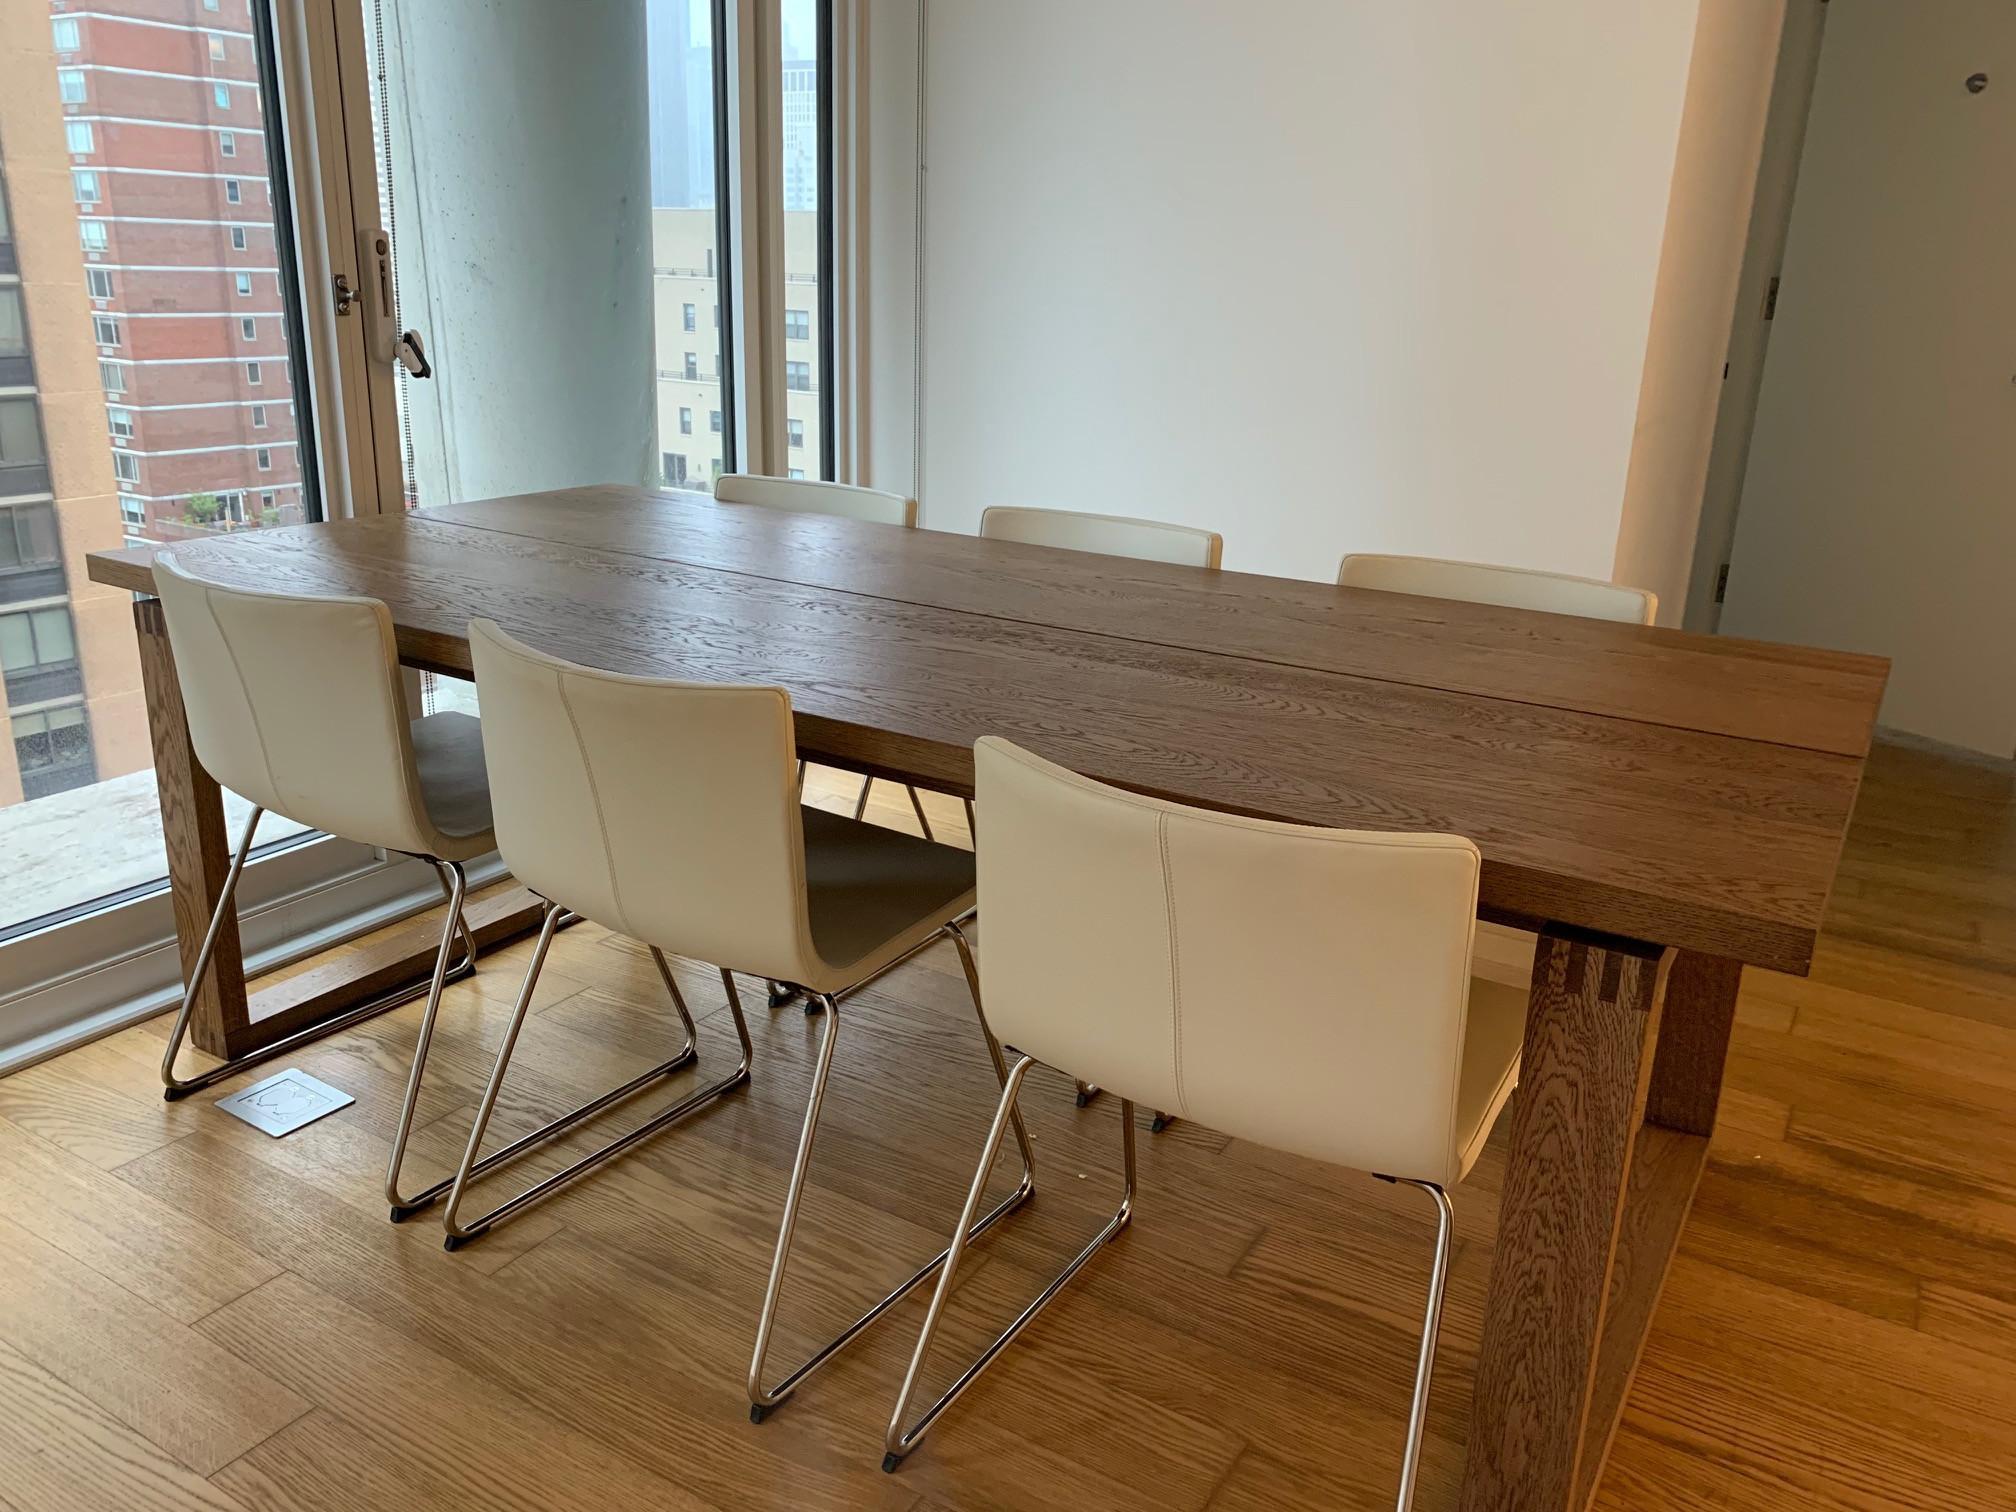 Ikea Morbylanga Dining Table w/ 6 Bernhard Chairs